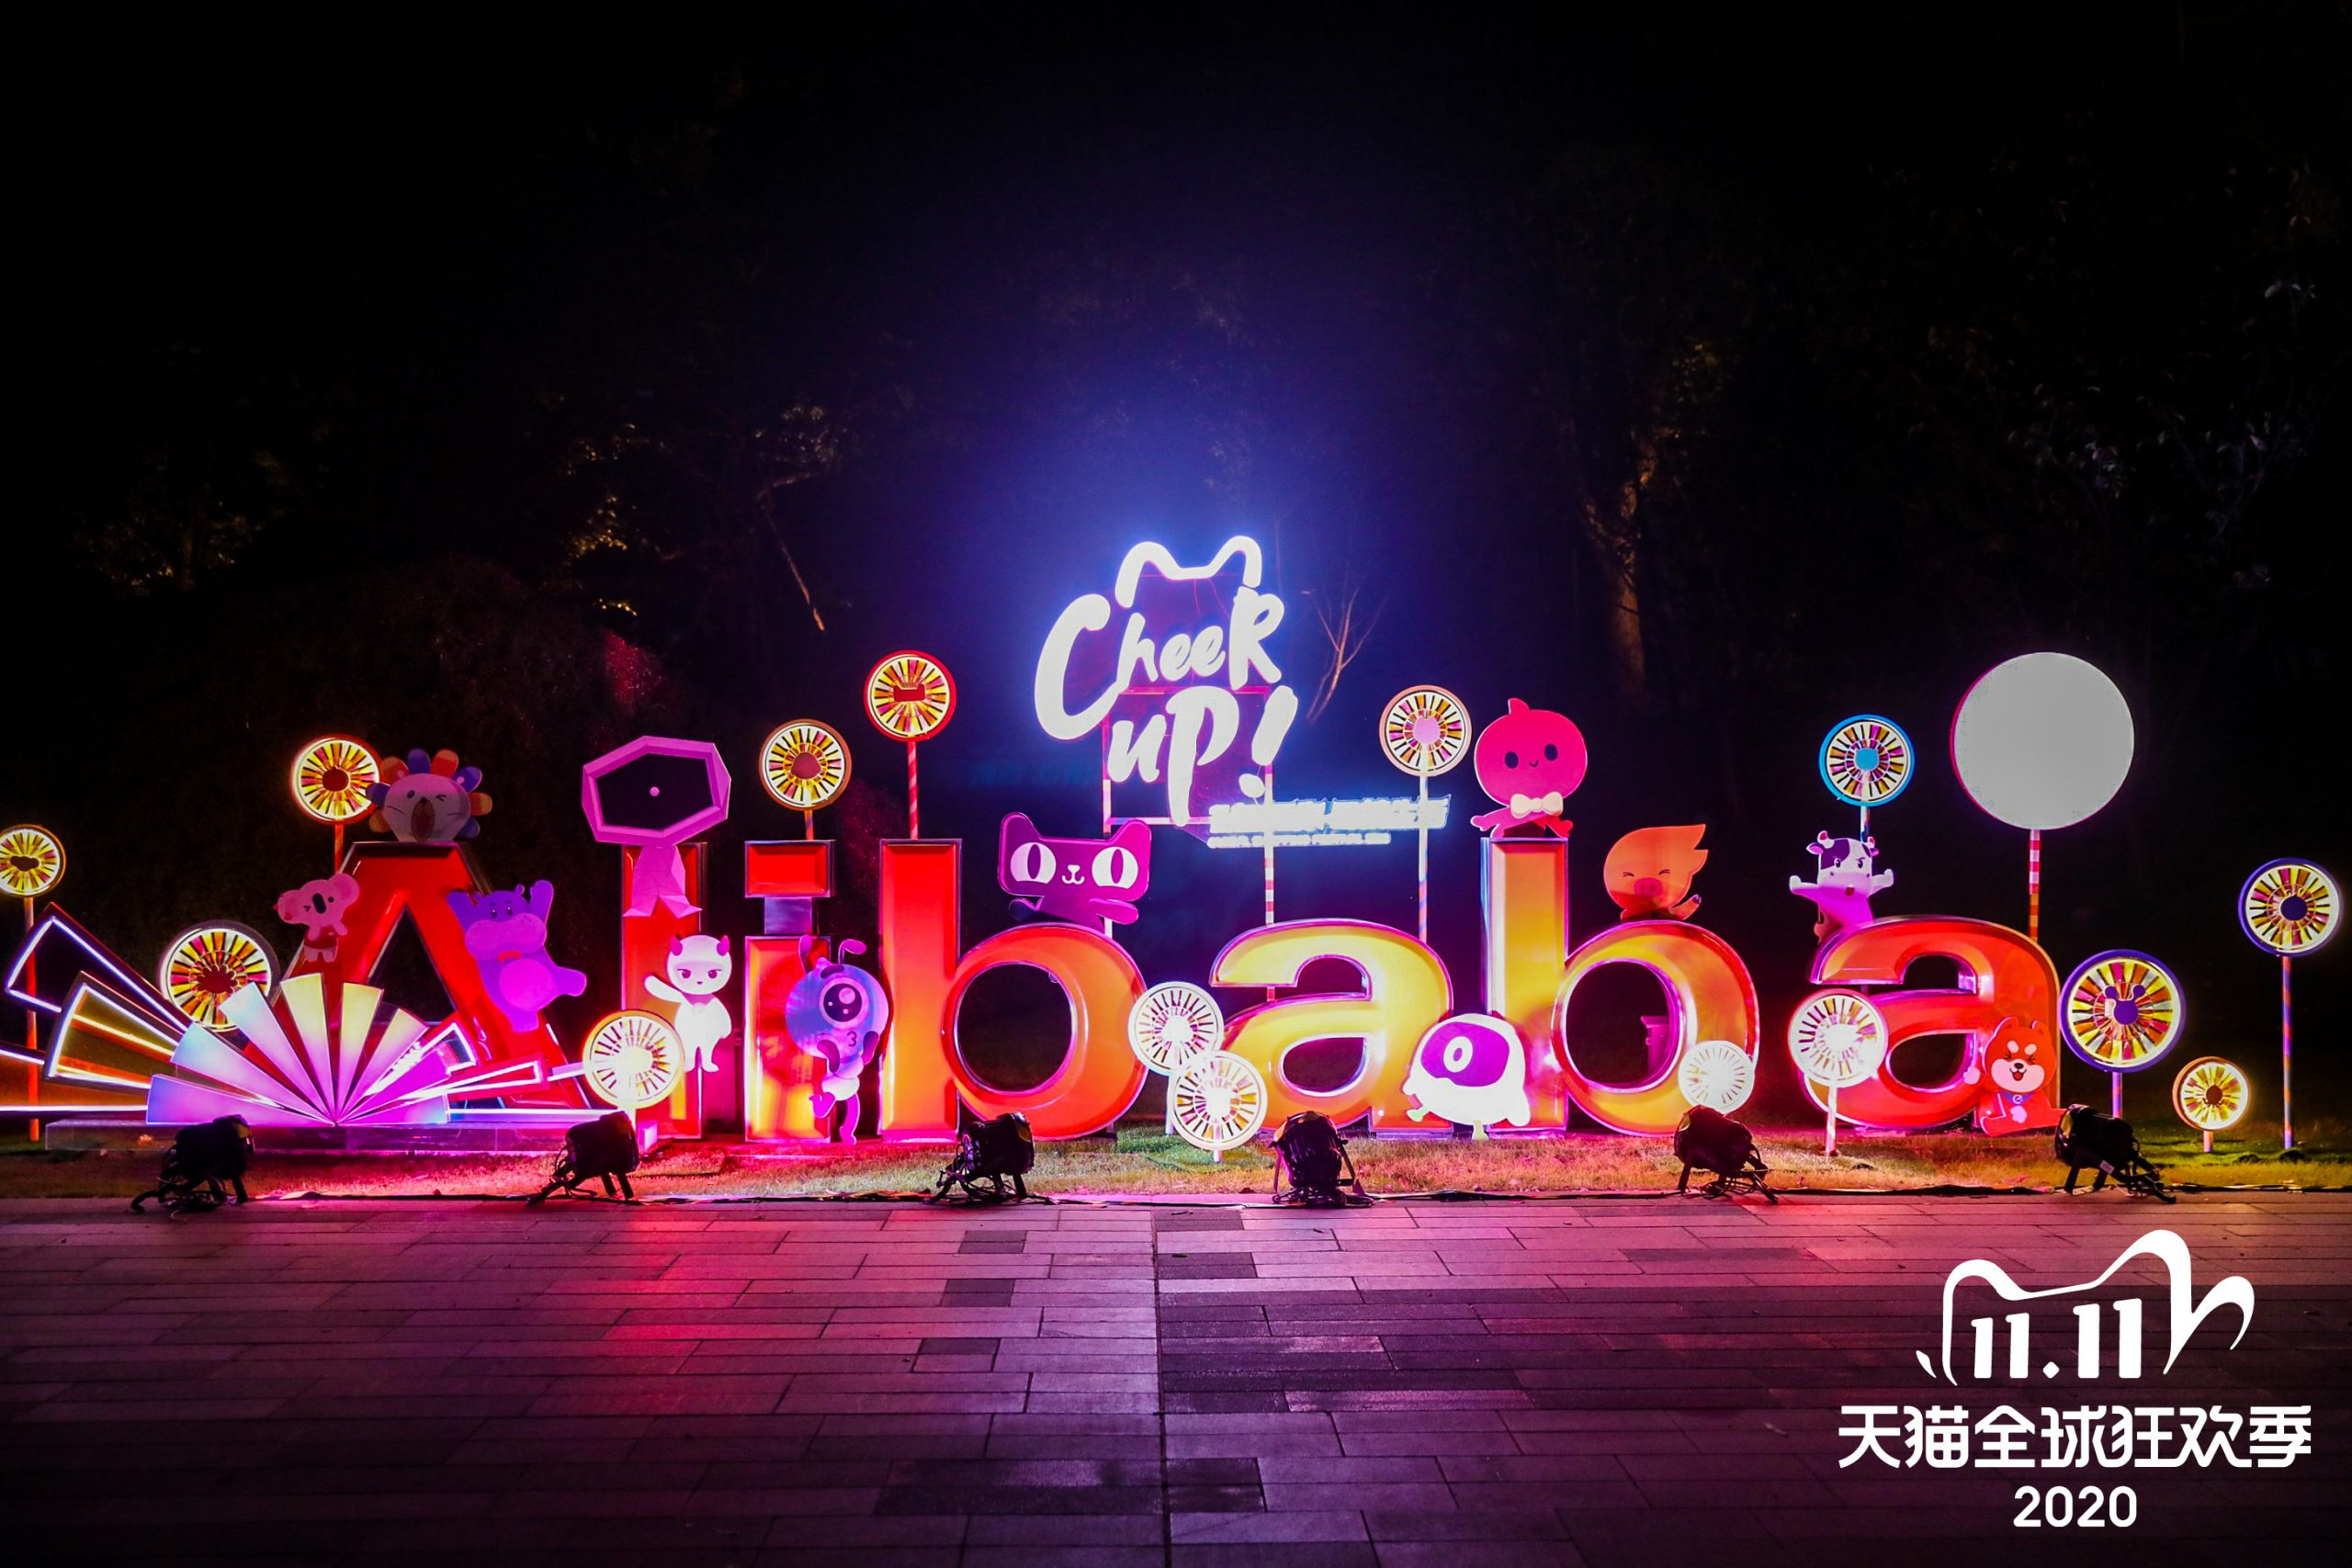 Alibaba Information Roundup: 11/11 Remaining Ideas, Fliggy's Digital Travelogue, and Cainiao Heading to Japan